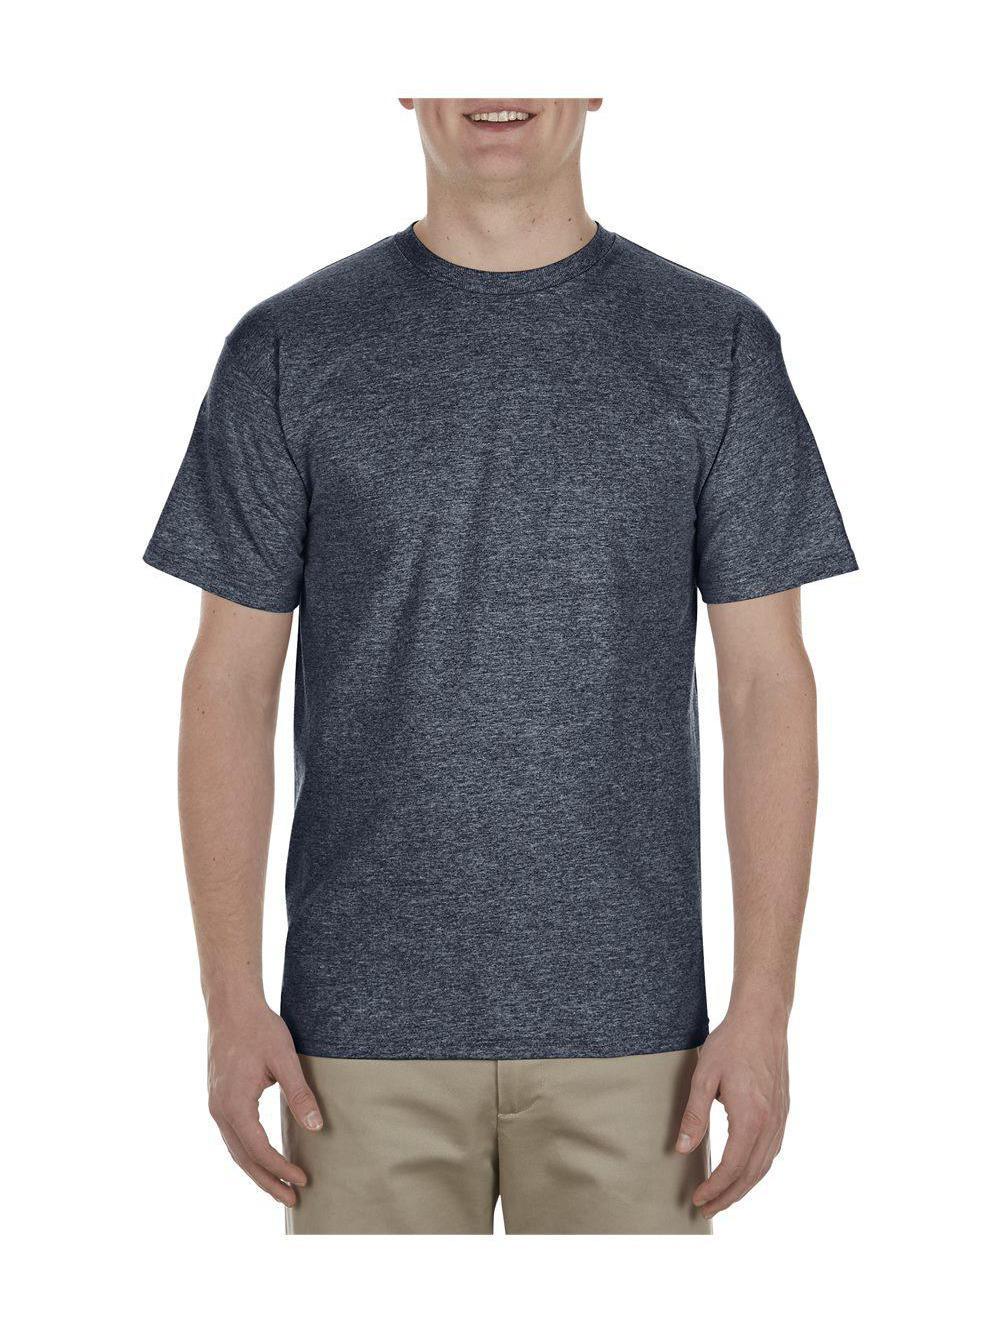 ALSTYLE-Premium-T-Shirt-1701 thumbnail 37